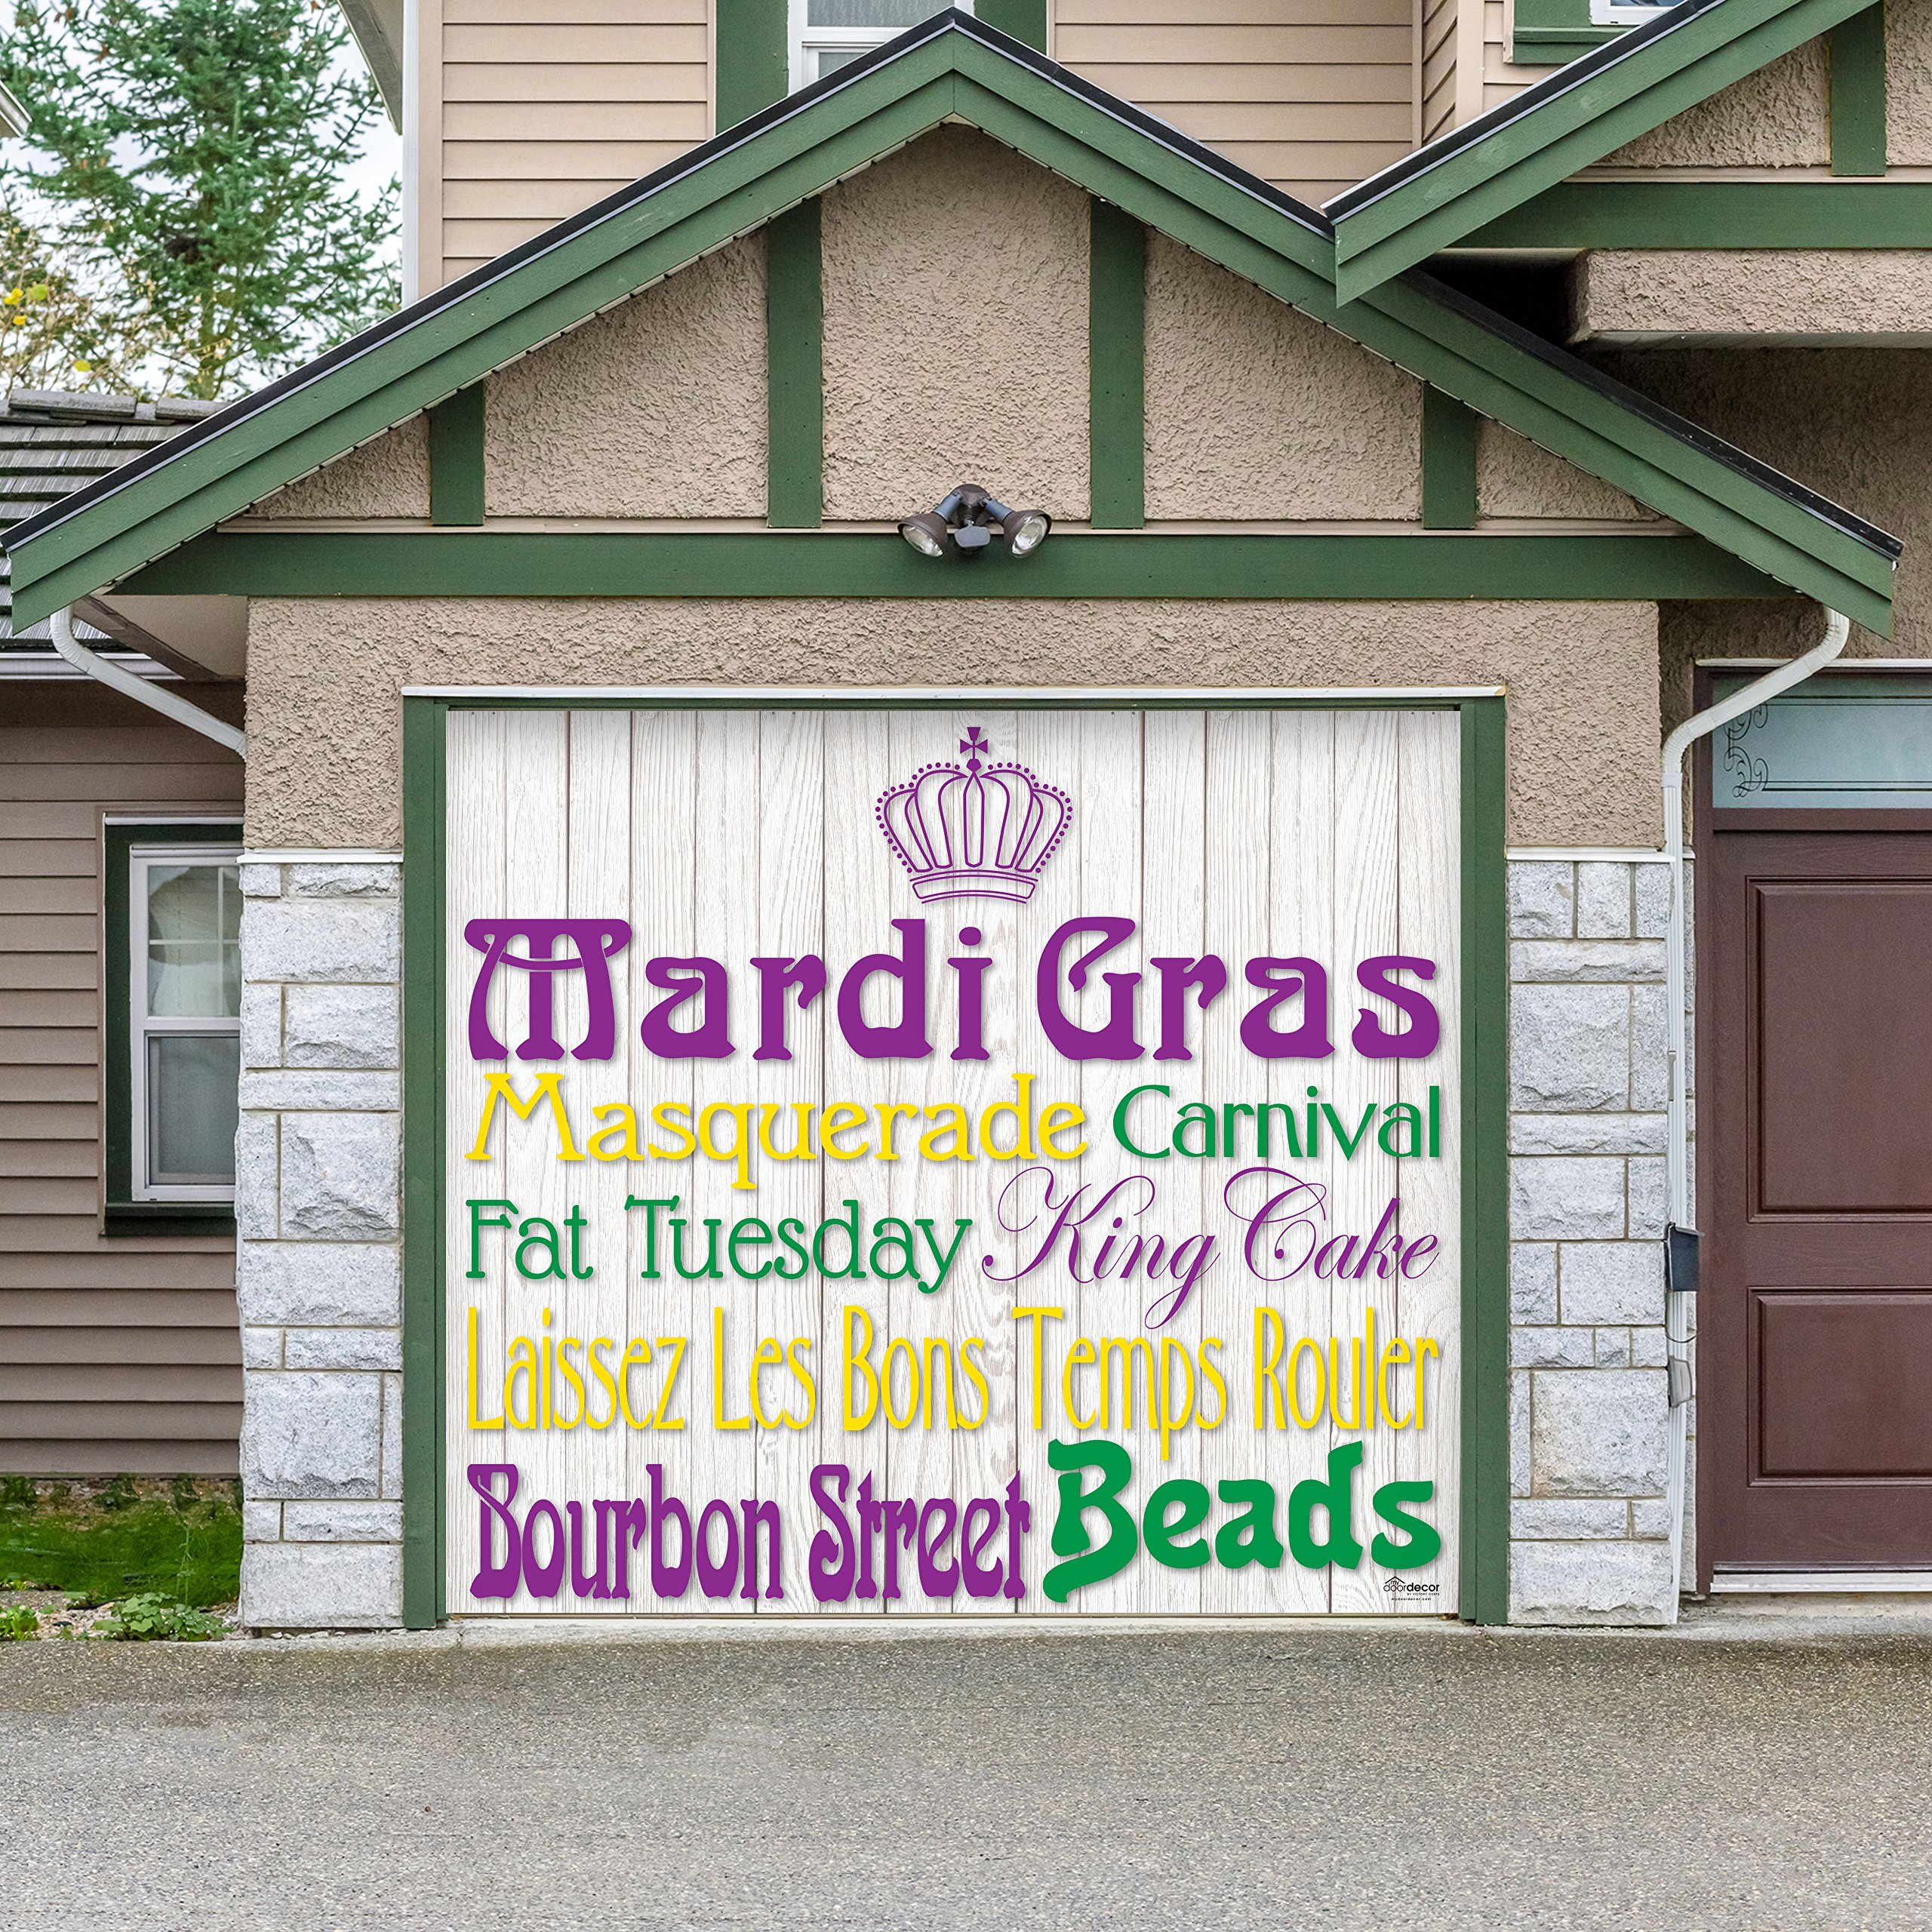 Outdoor Mardi Gras Decorations Garage Door Banner Cover Mural Décoration 8'x9' - Mardi Gras Words - ''The Original Mardi Gras Supplies Holiday Garage Door Banner Decor''